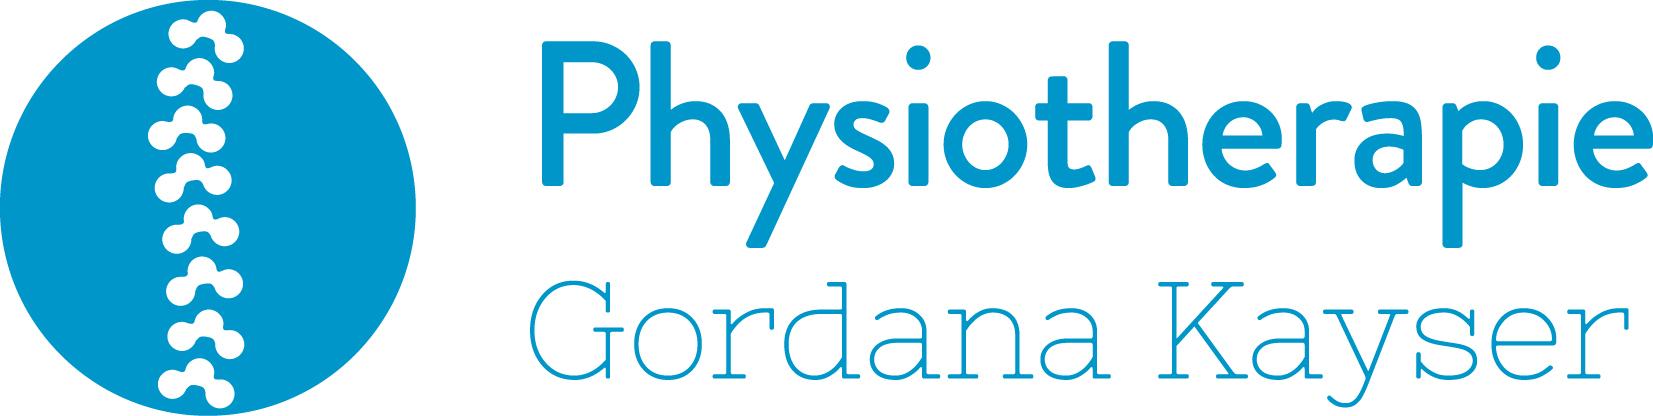 Physiotherapie Gordana Kayser